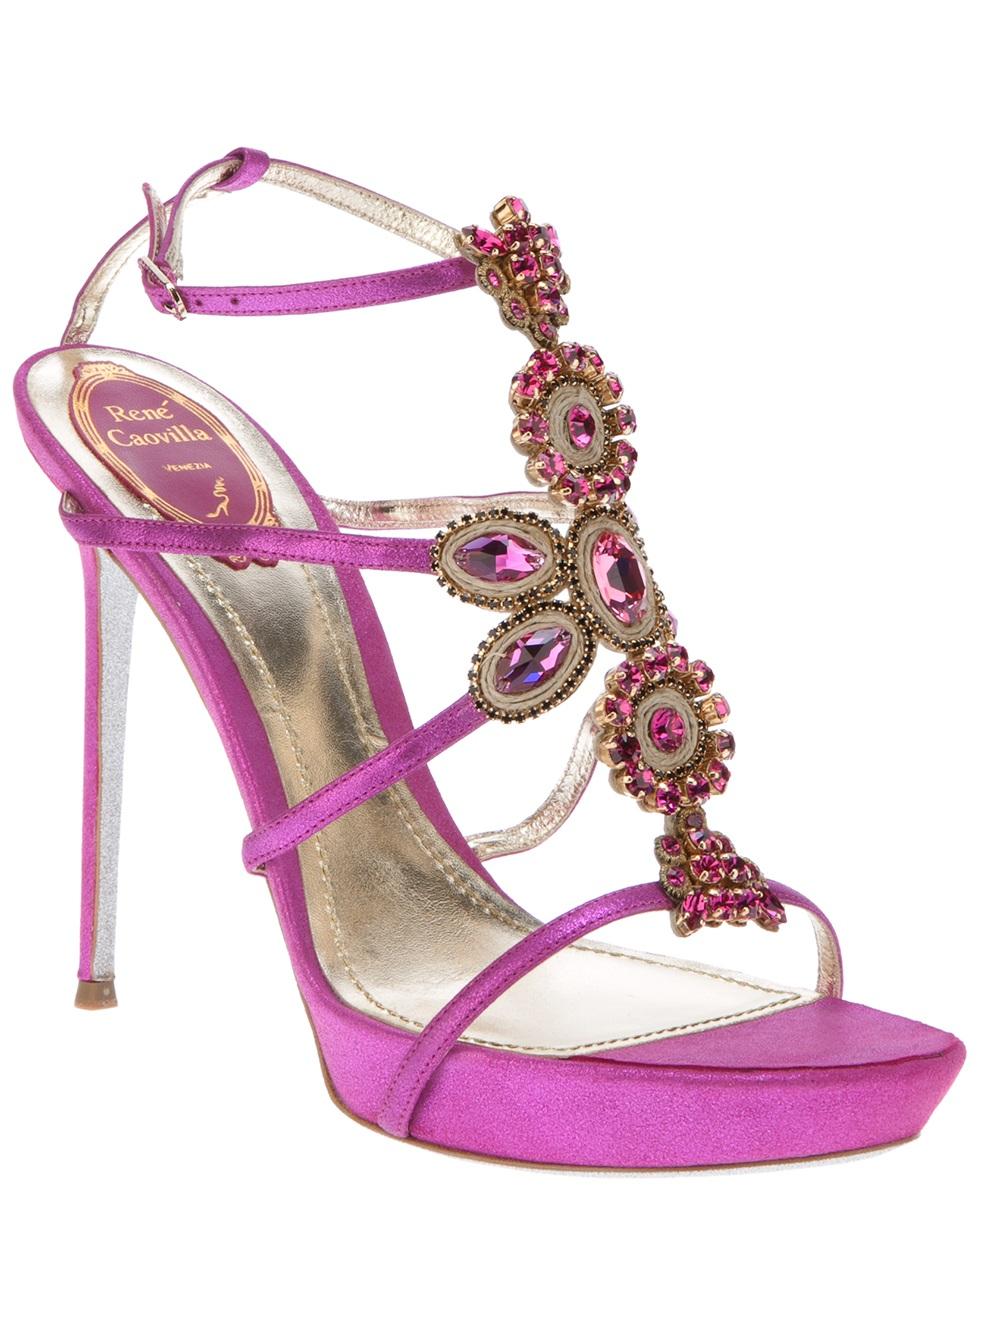 e382c9ebd1c Rene Caovilla Jewel Embellished Sandal in Pink - Lyst